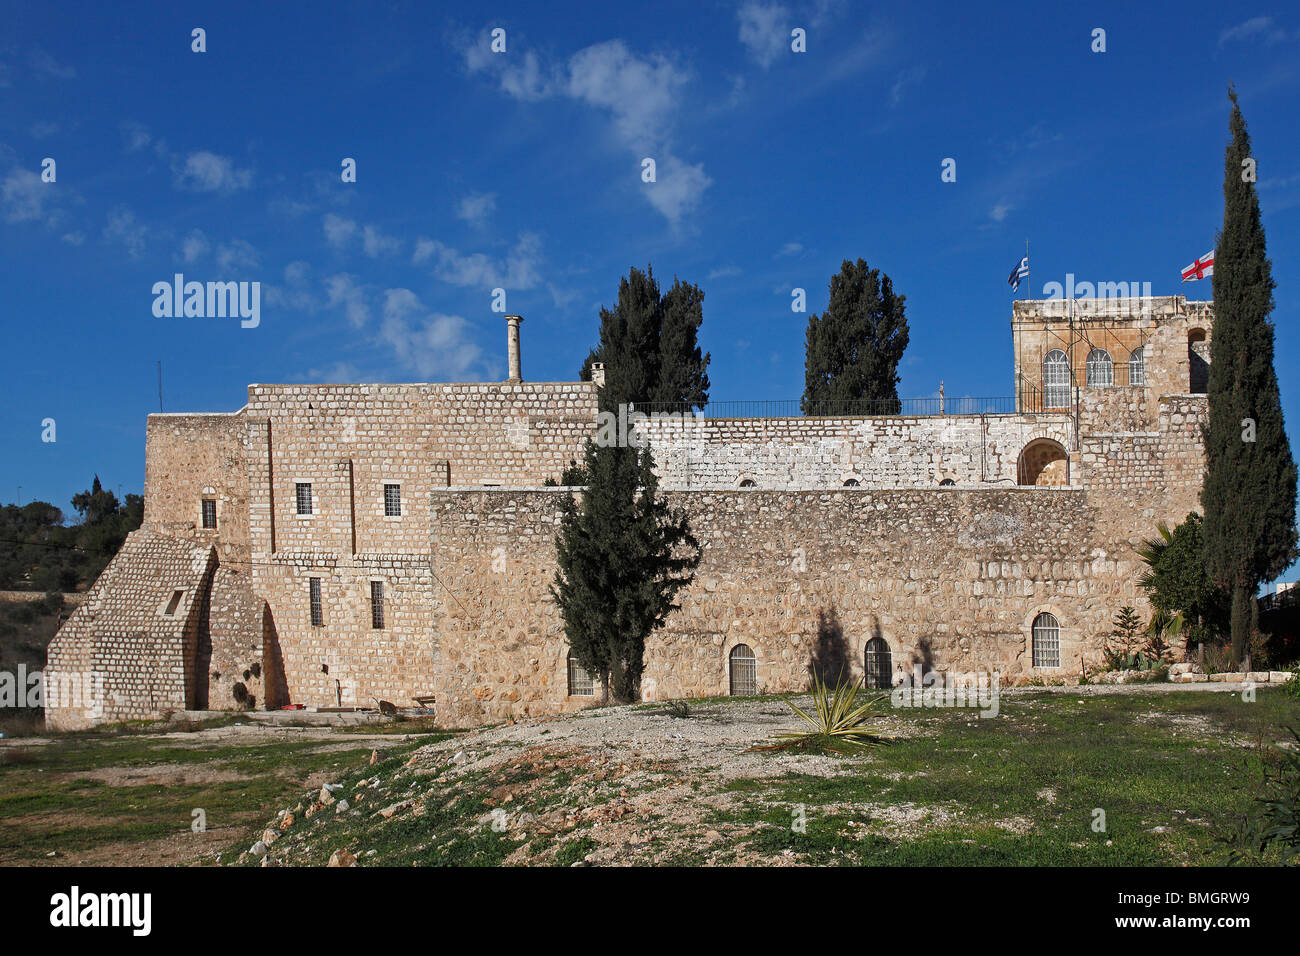 Israel,Jerusalem,St. Cross Monastery,Greek Orthodox Patriarchate,fortified walls - Stock Image